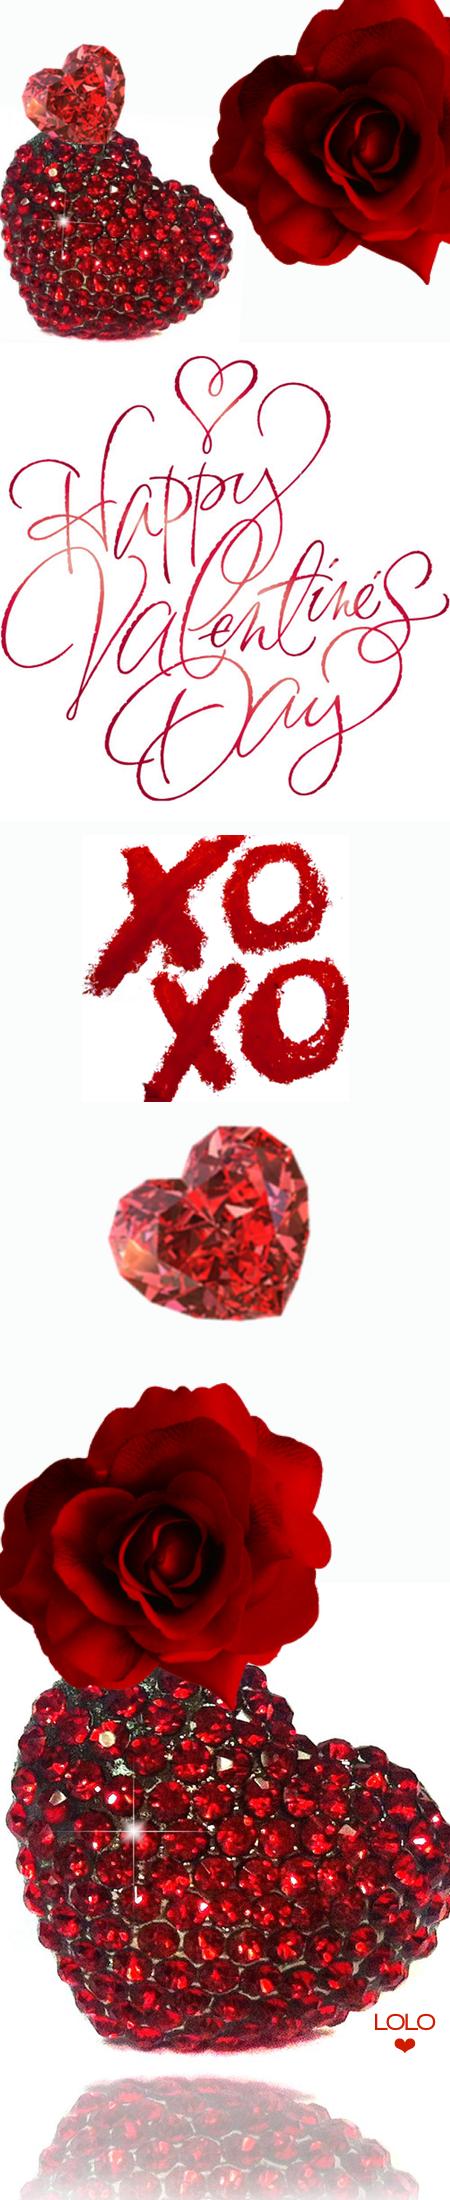 Happy valentineus day lolo my funny little valentine